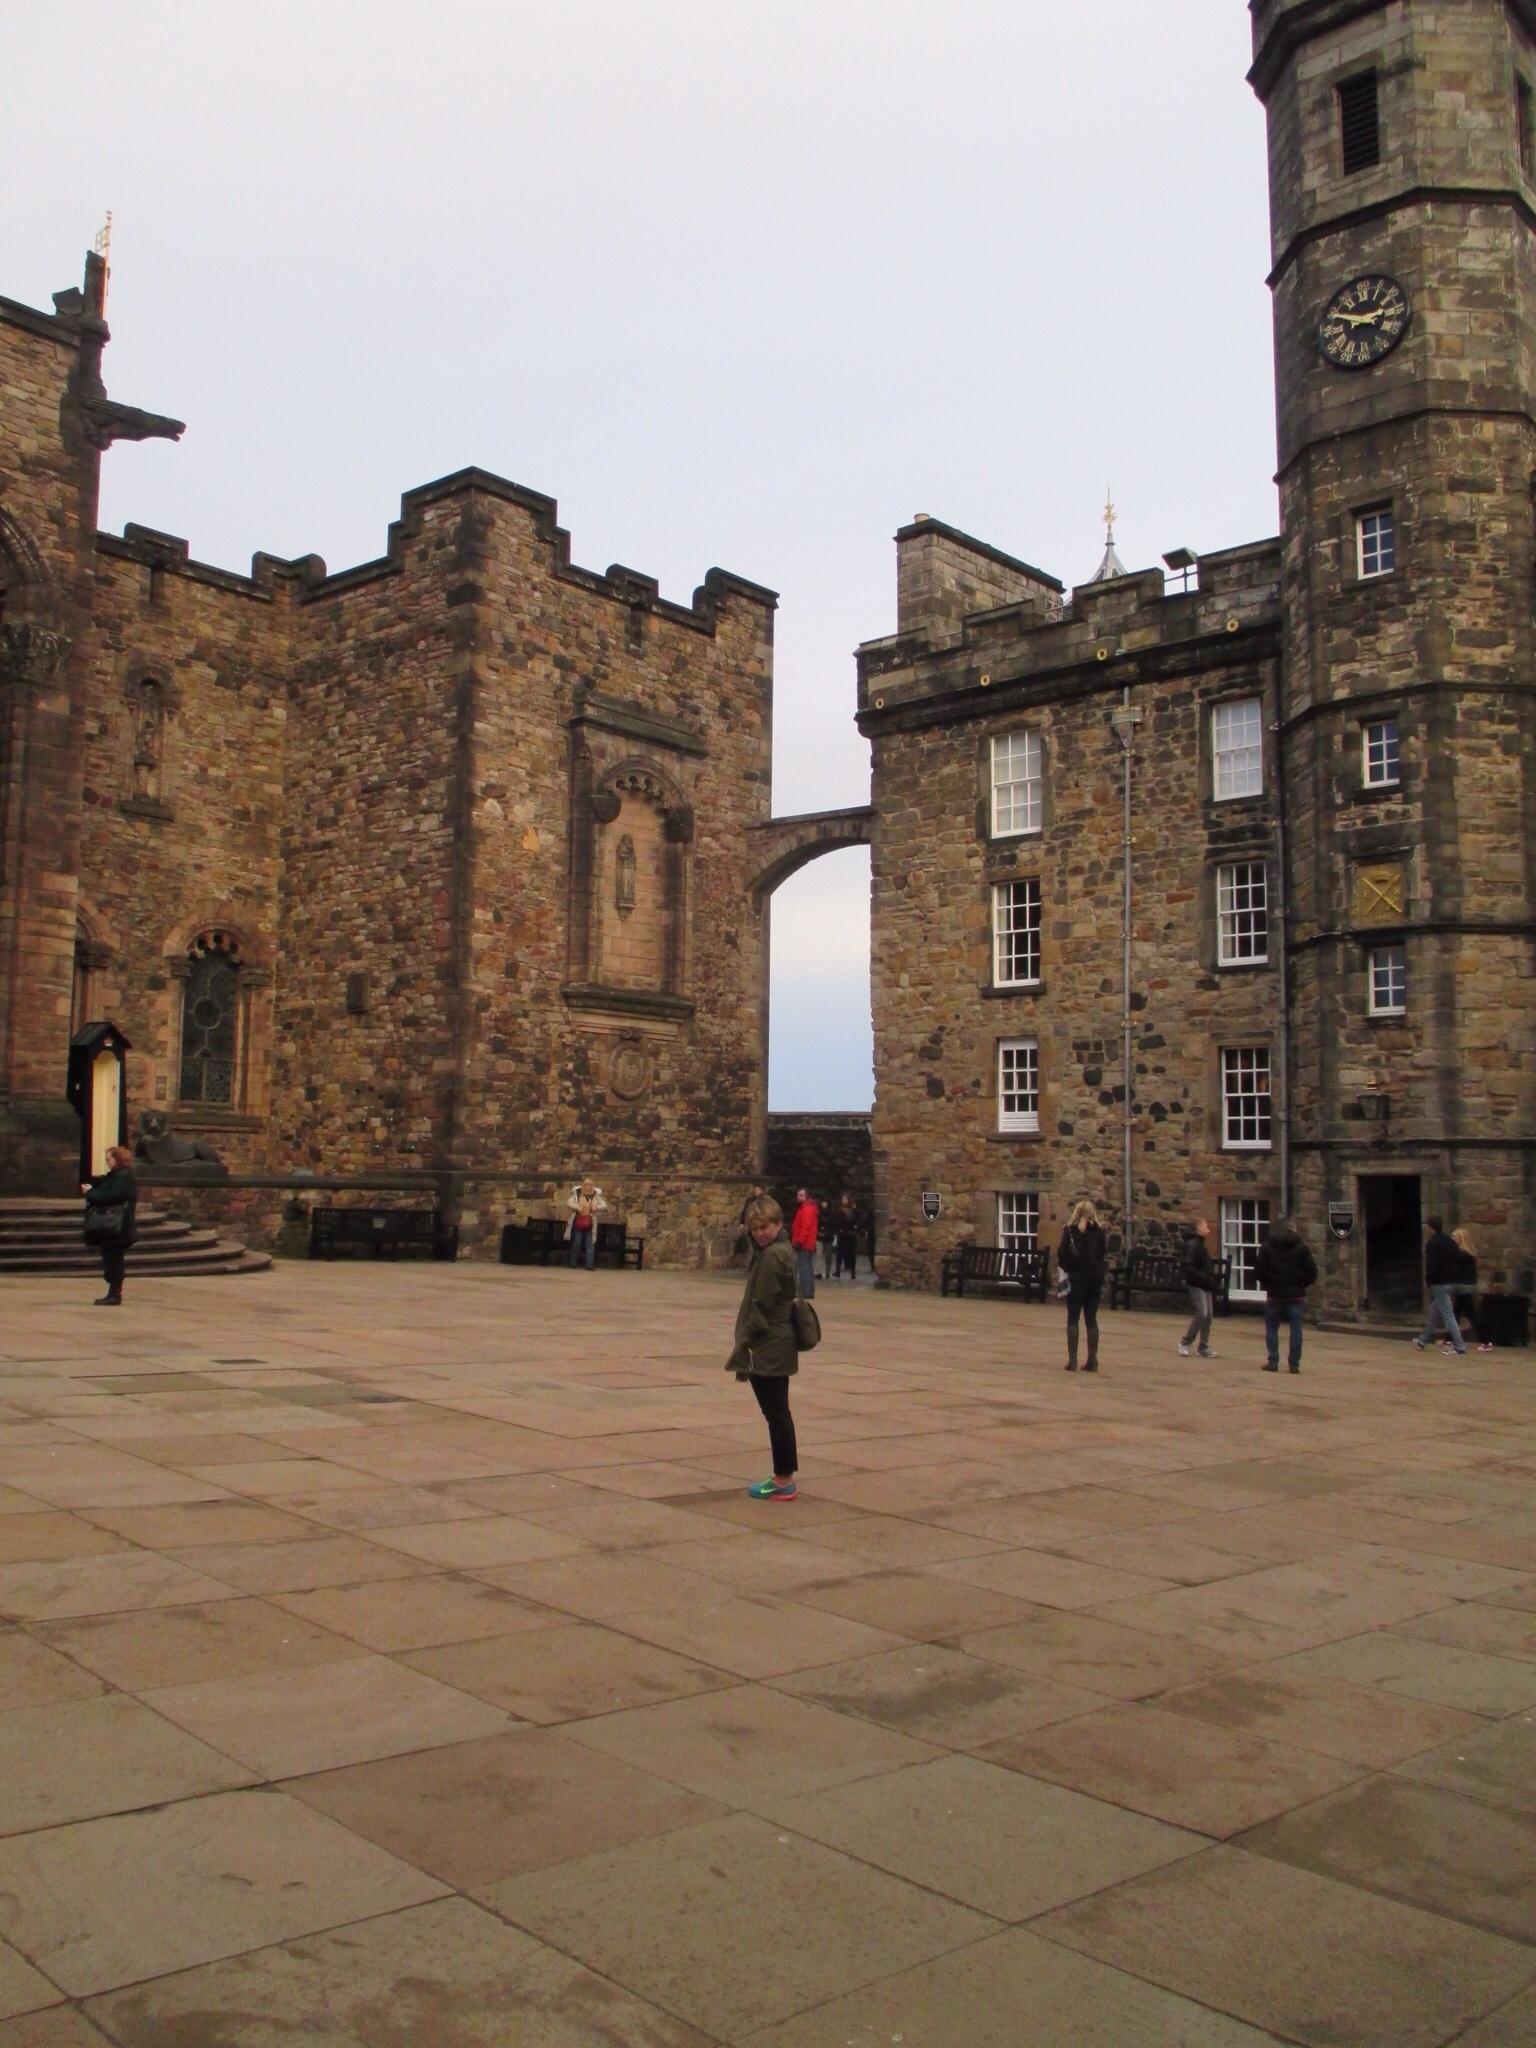 Samantha in the central square of Edinburgh Castle